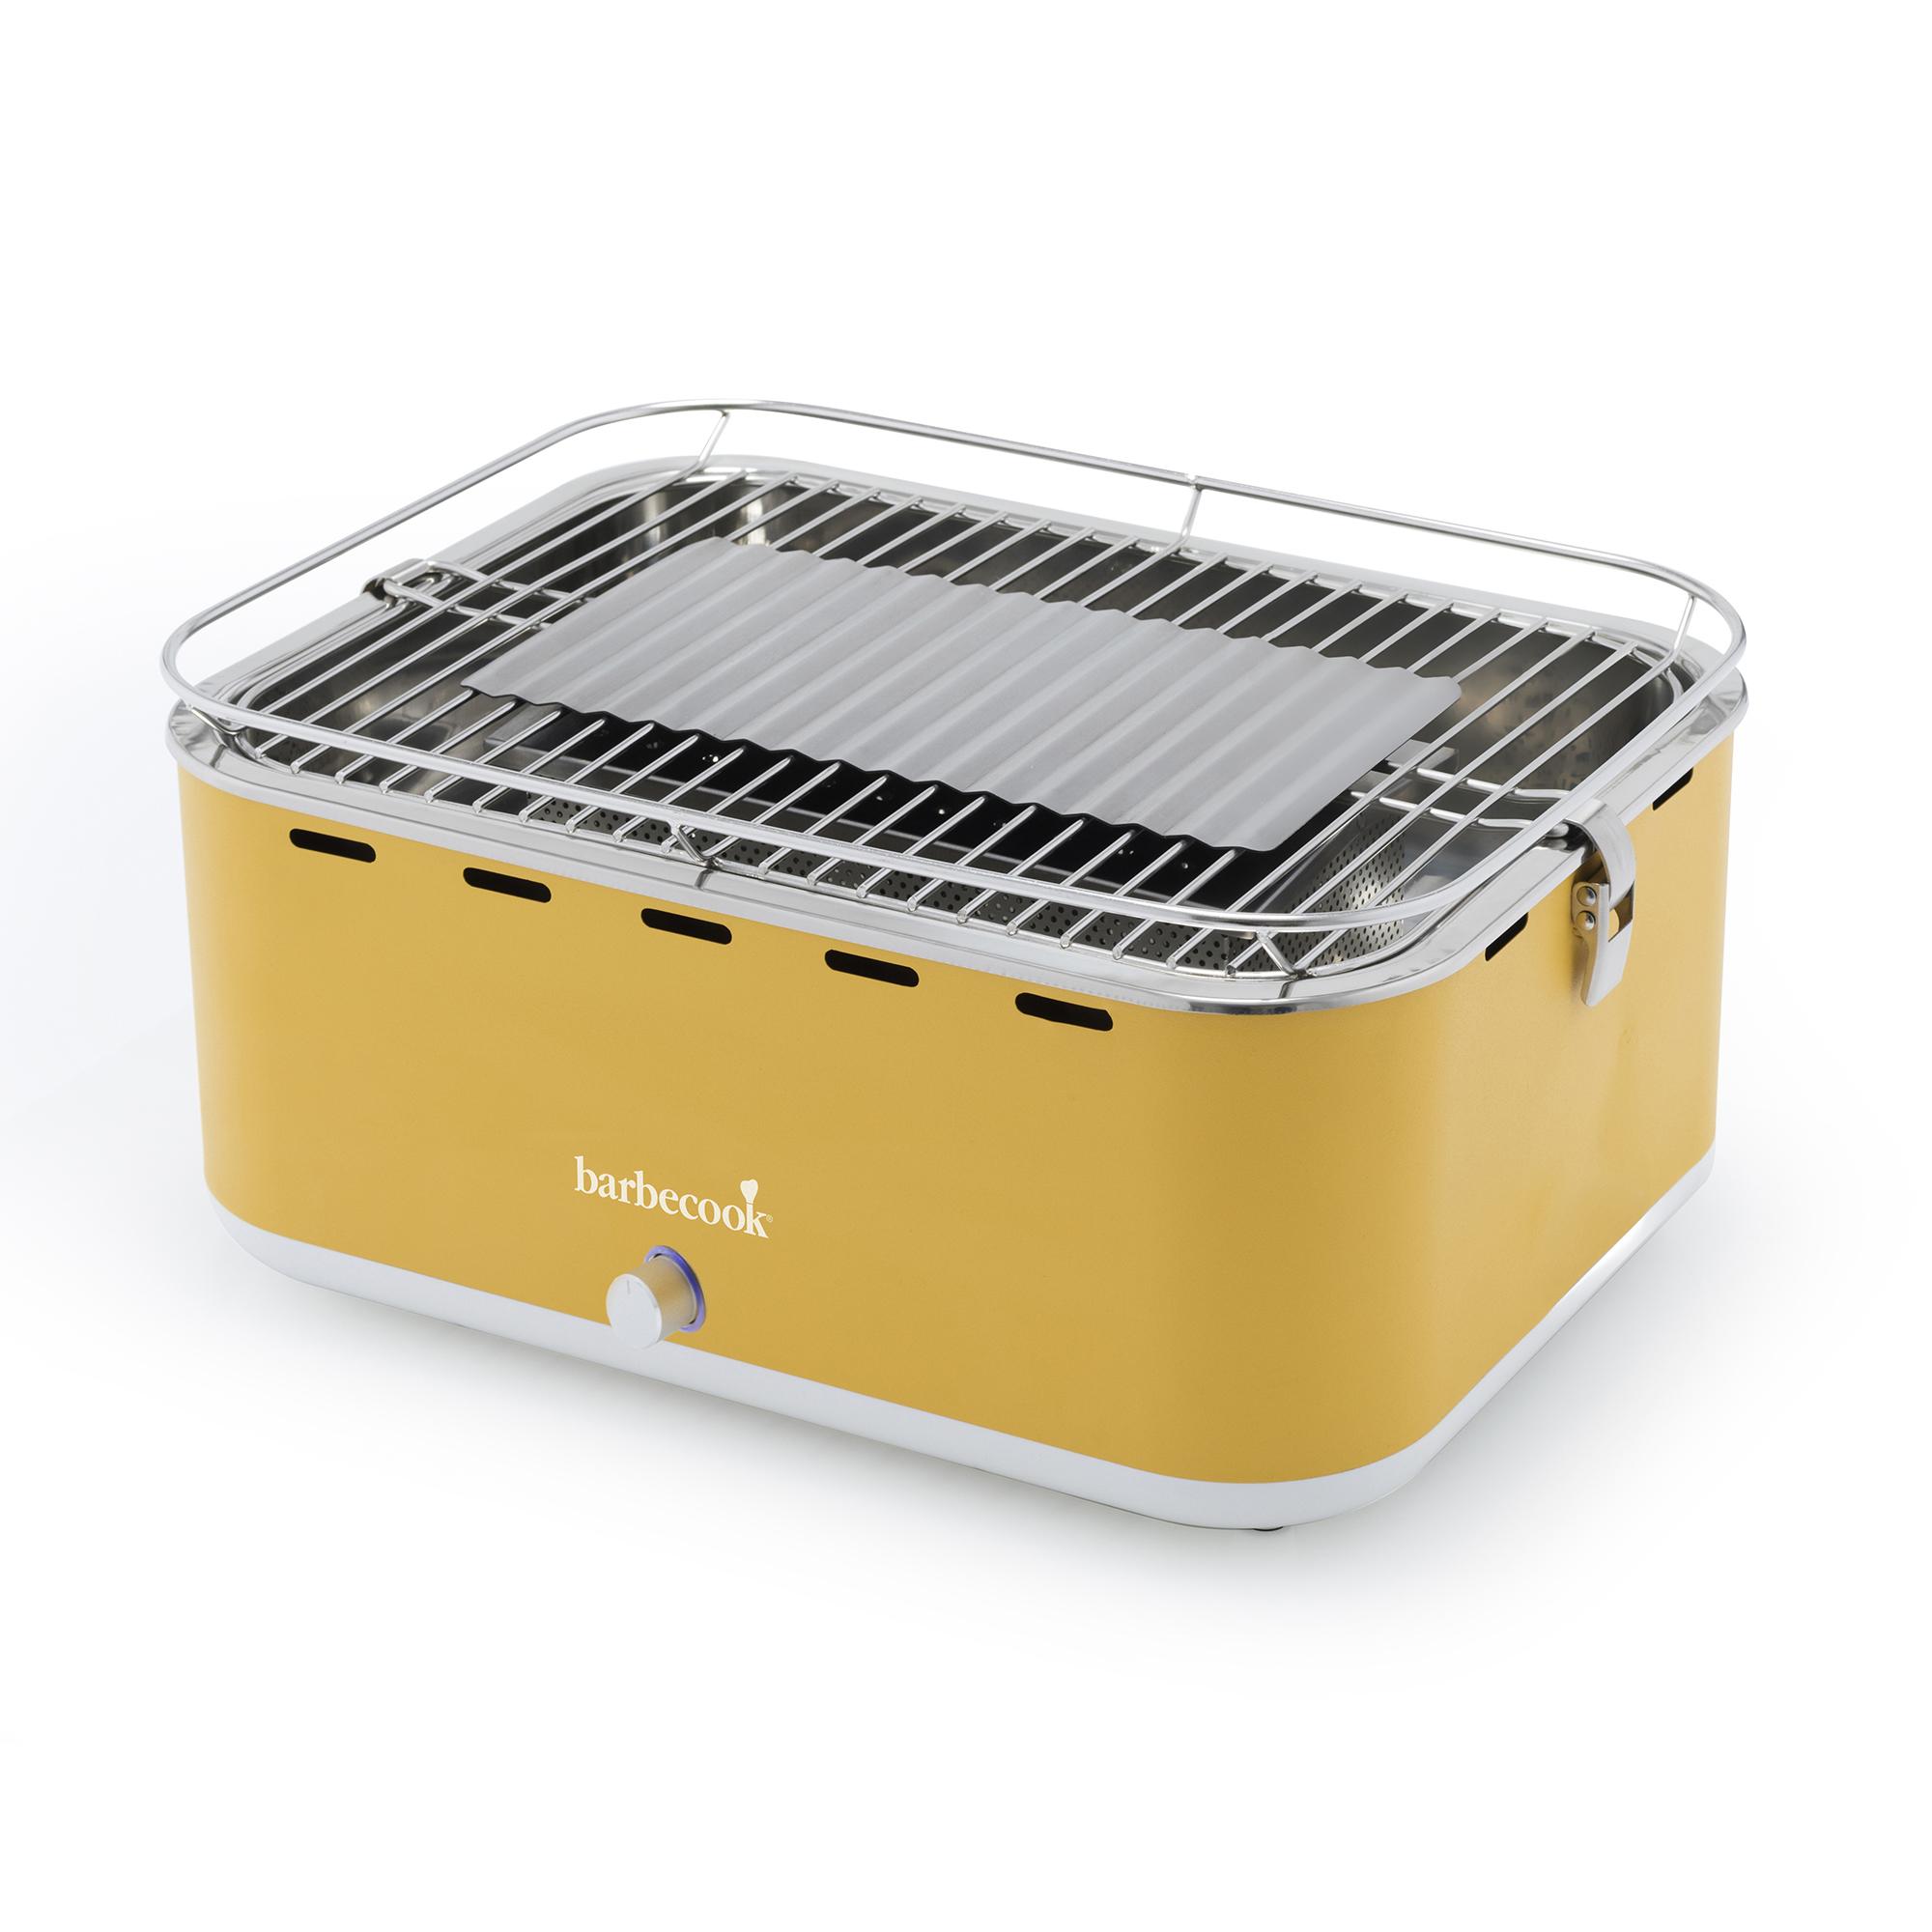 Barbecook Carlo - Sunshine Yellow